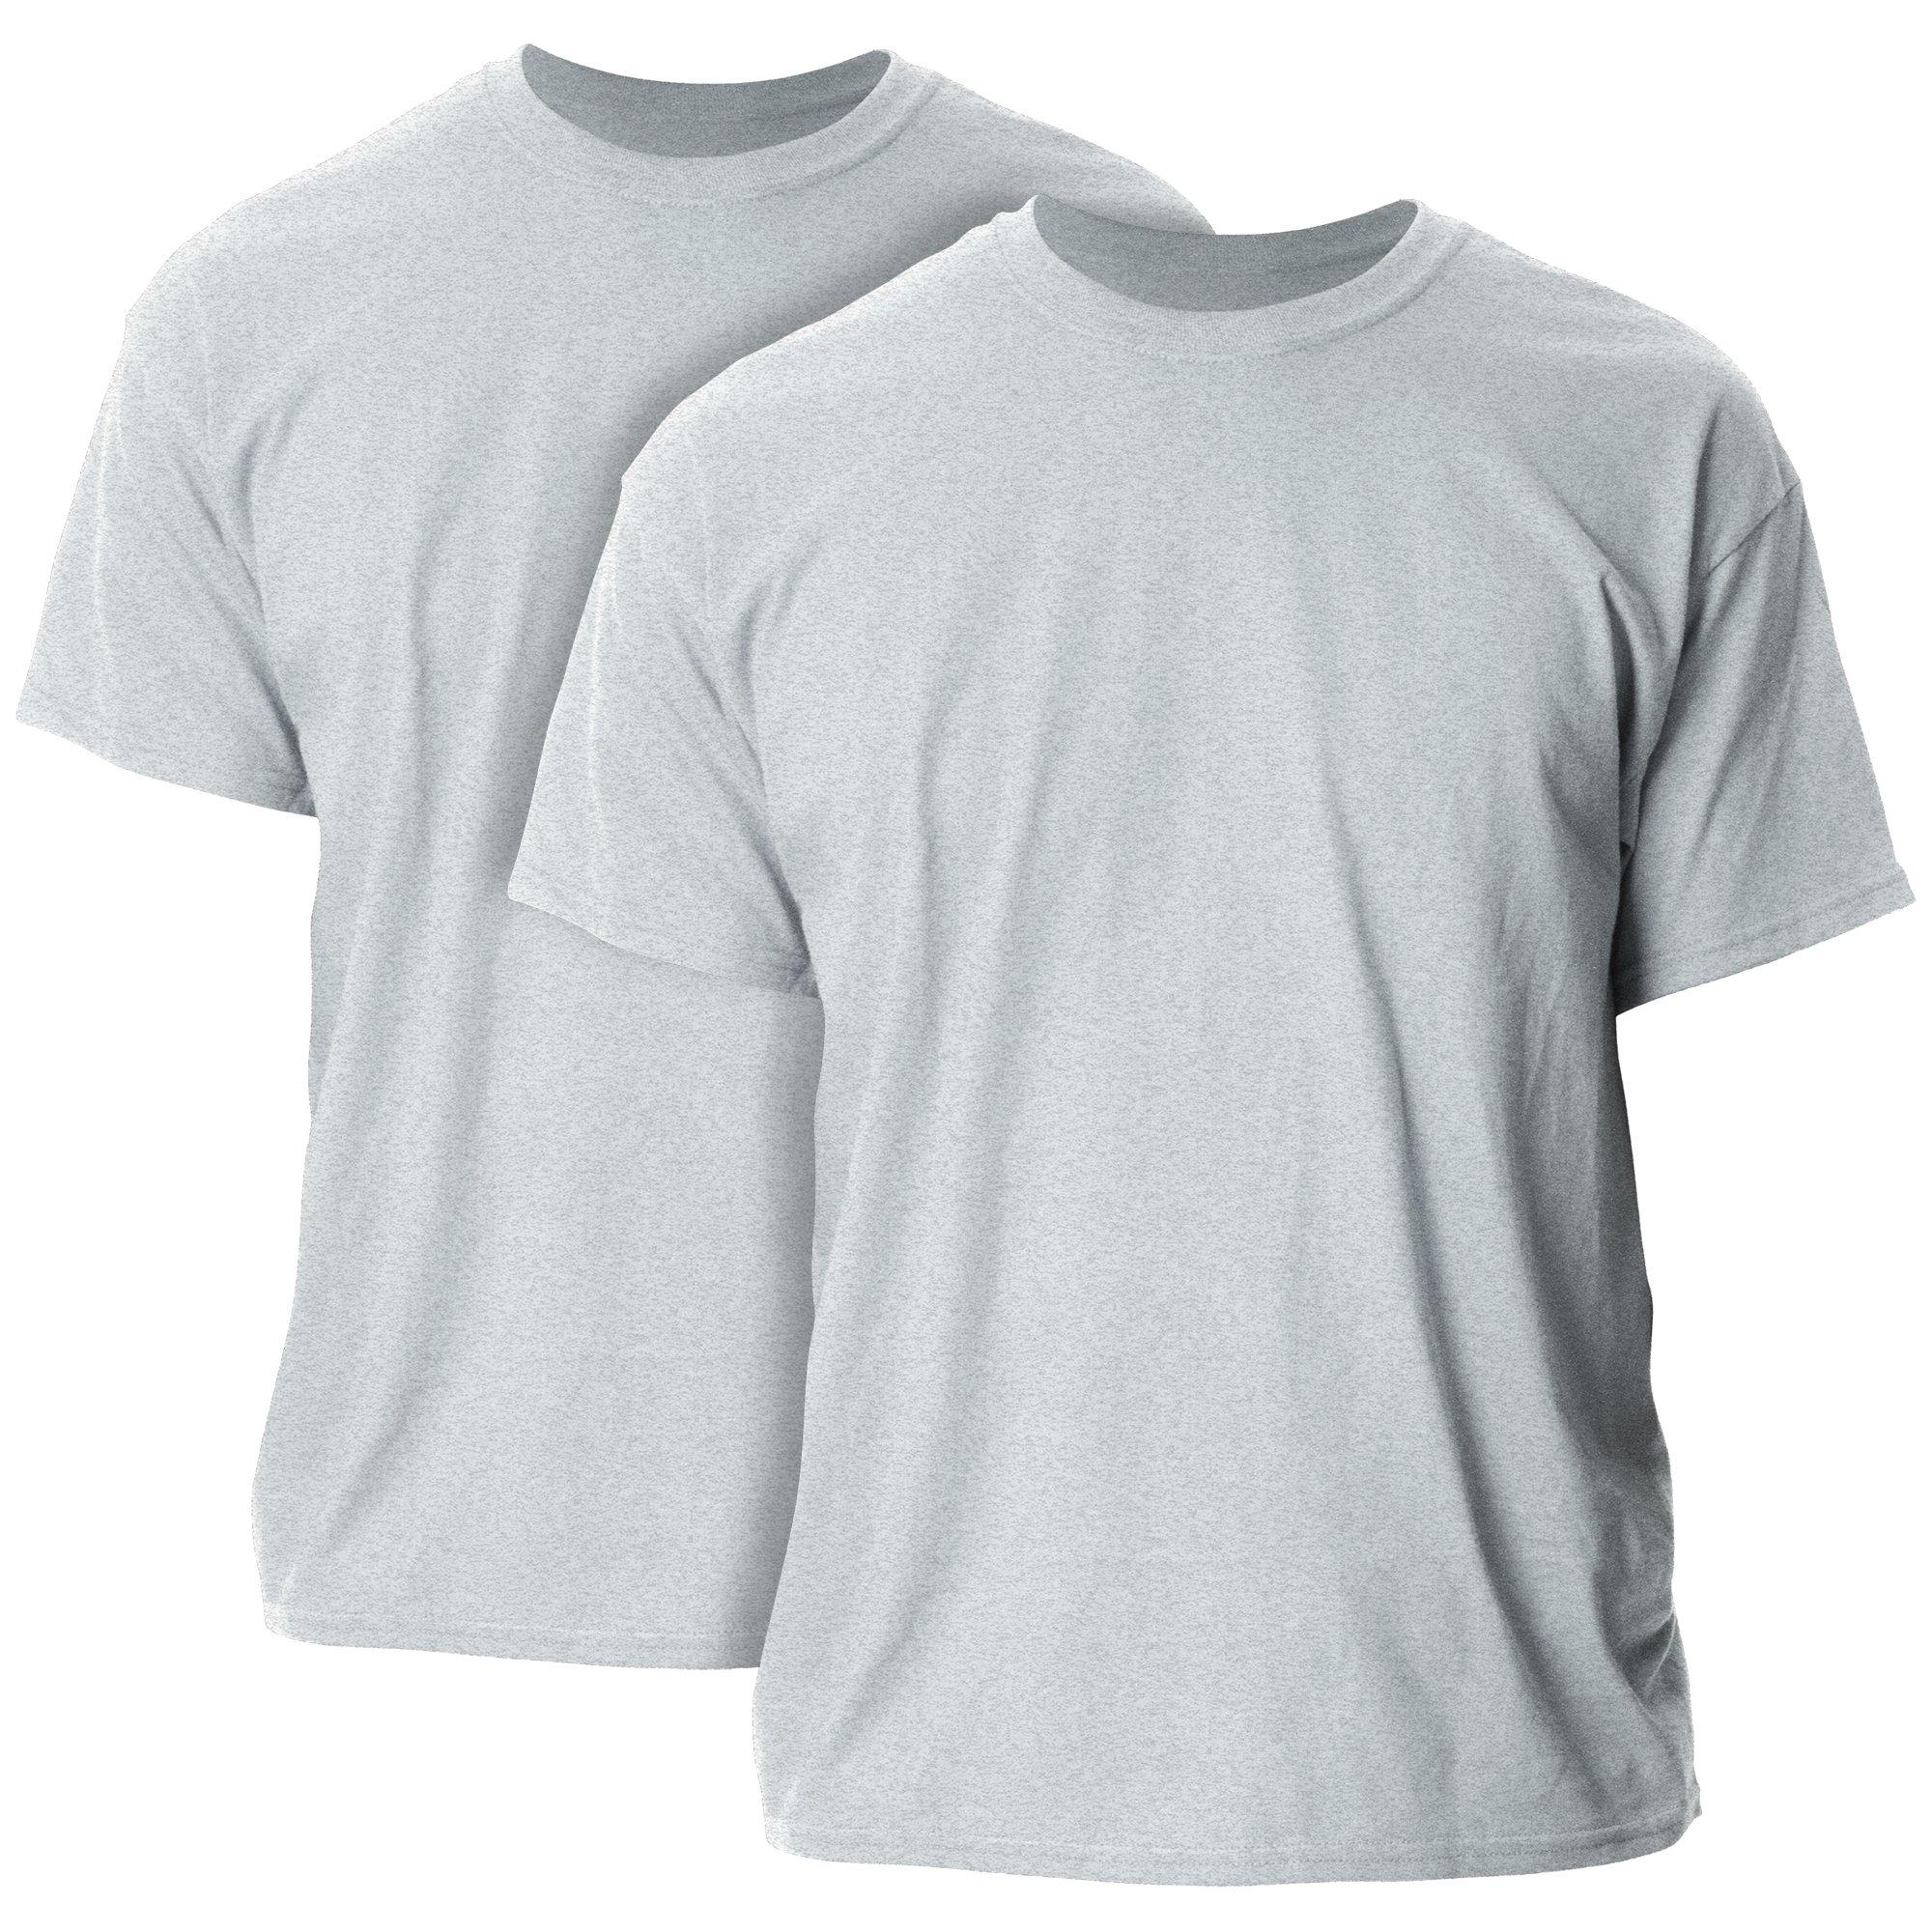 Gildan Men's Ultra Cotton Adult T-Shirt, 2-Pack, Sport Grey, 5X-Large by Gildan